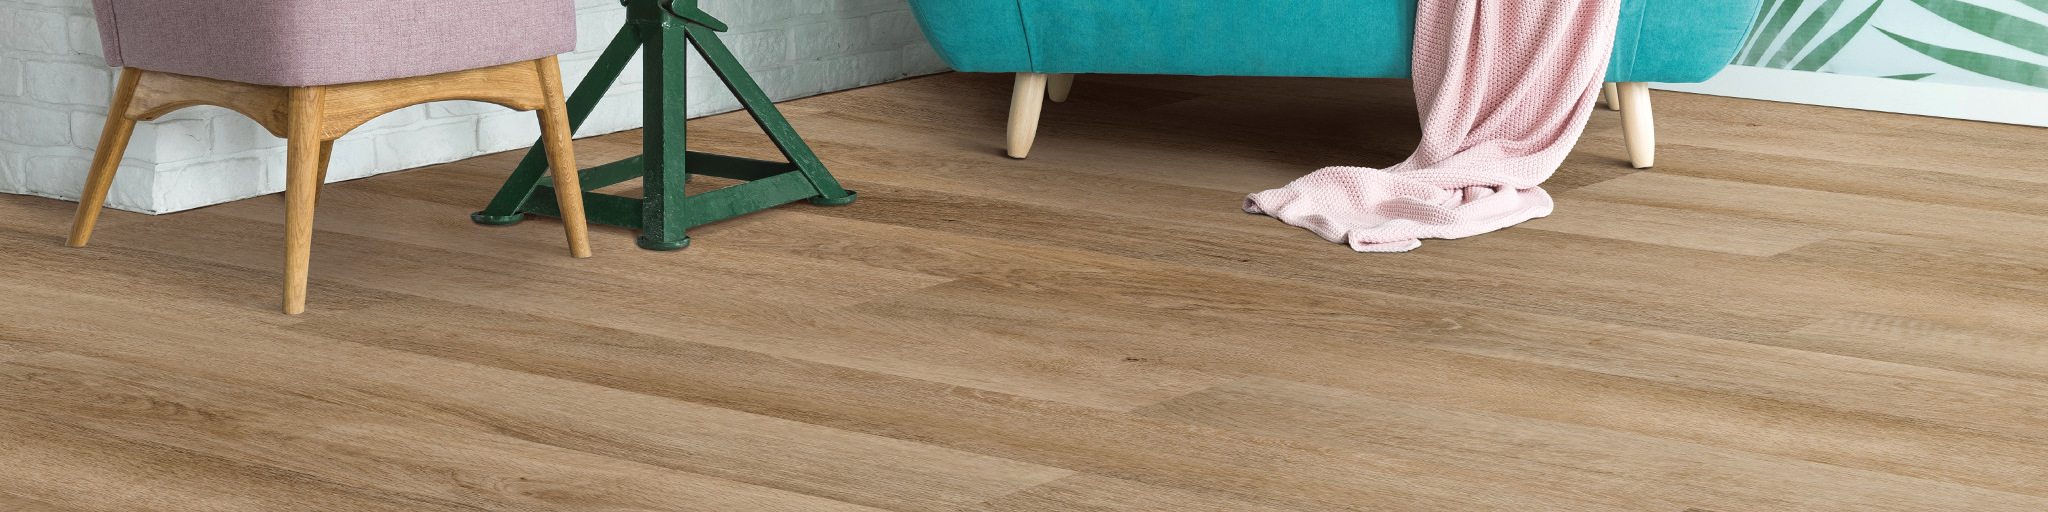 US Floors Coretec Plus VV023 00513 Brockportoak